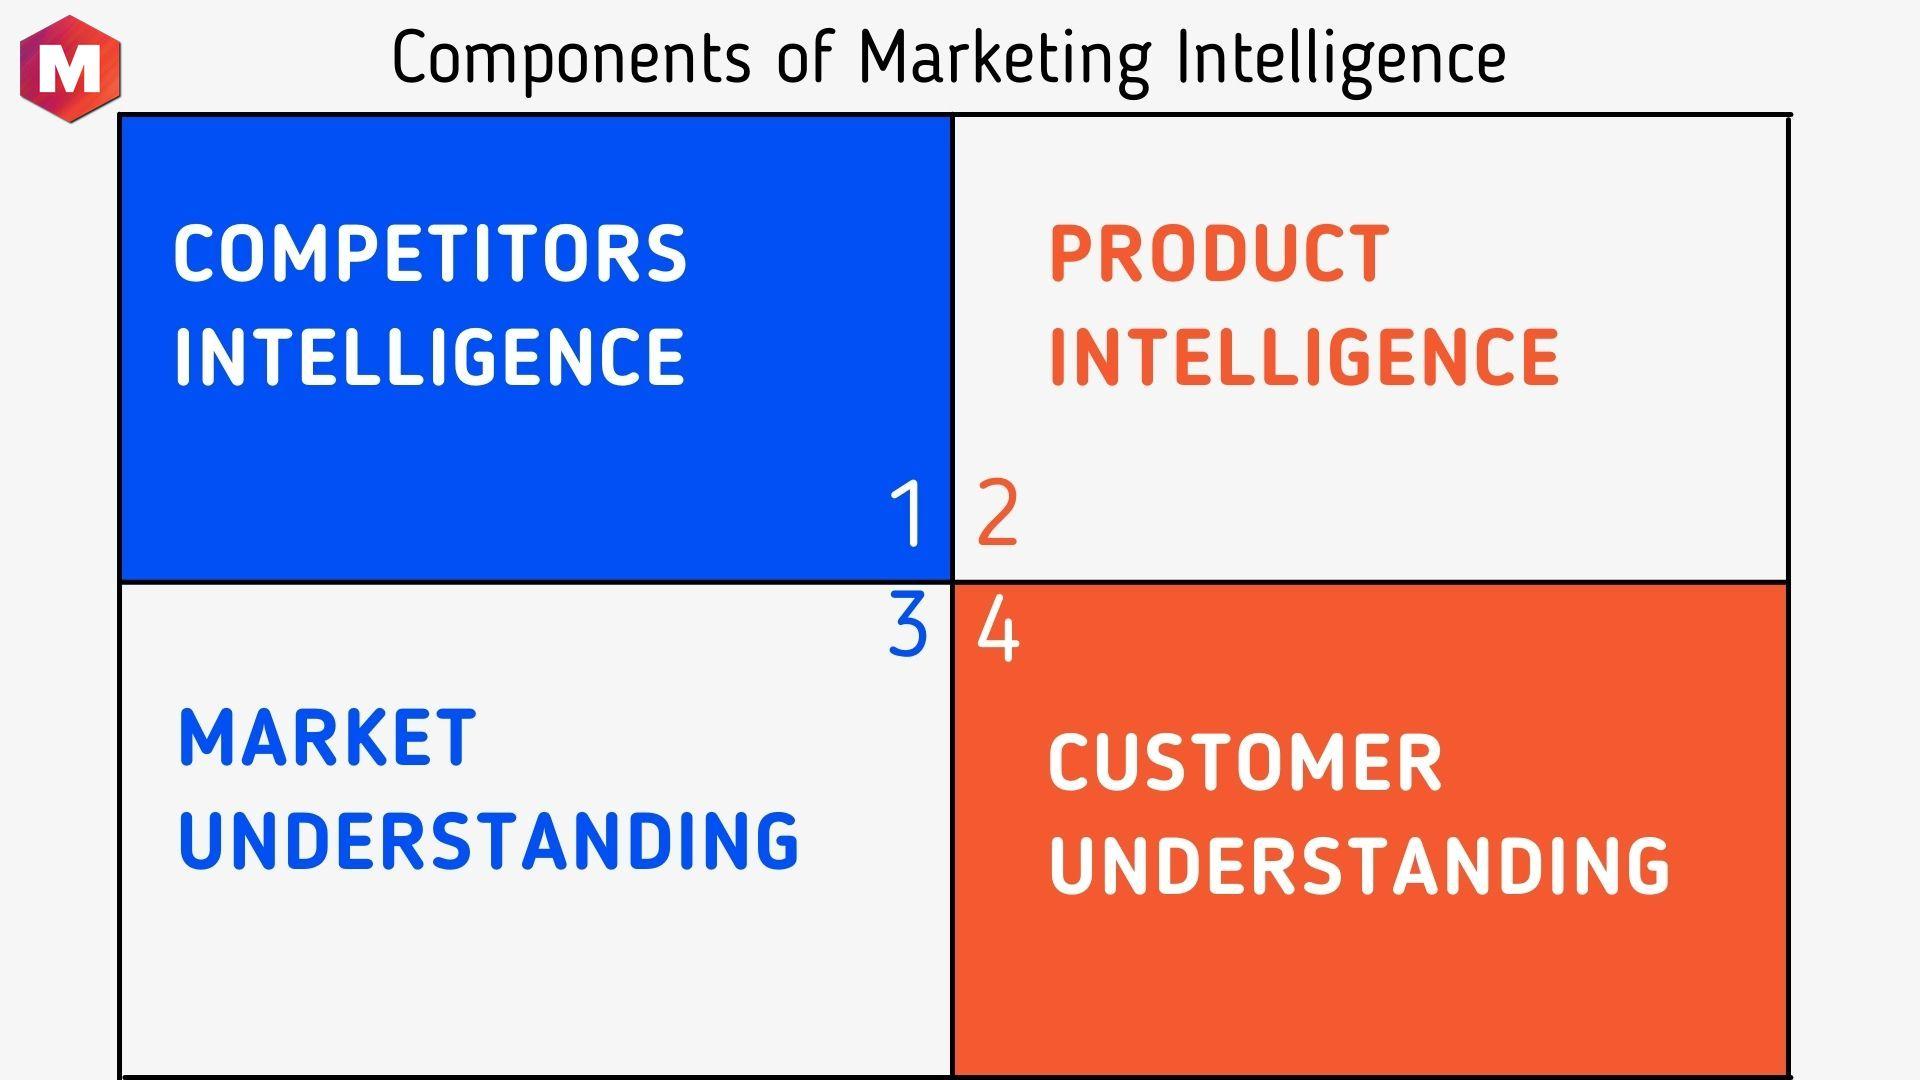 Components of Marketing Intelligence